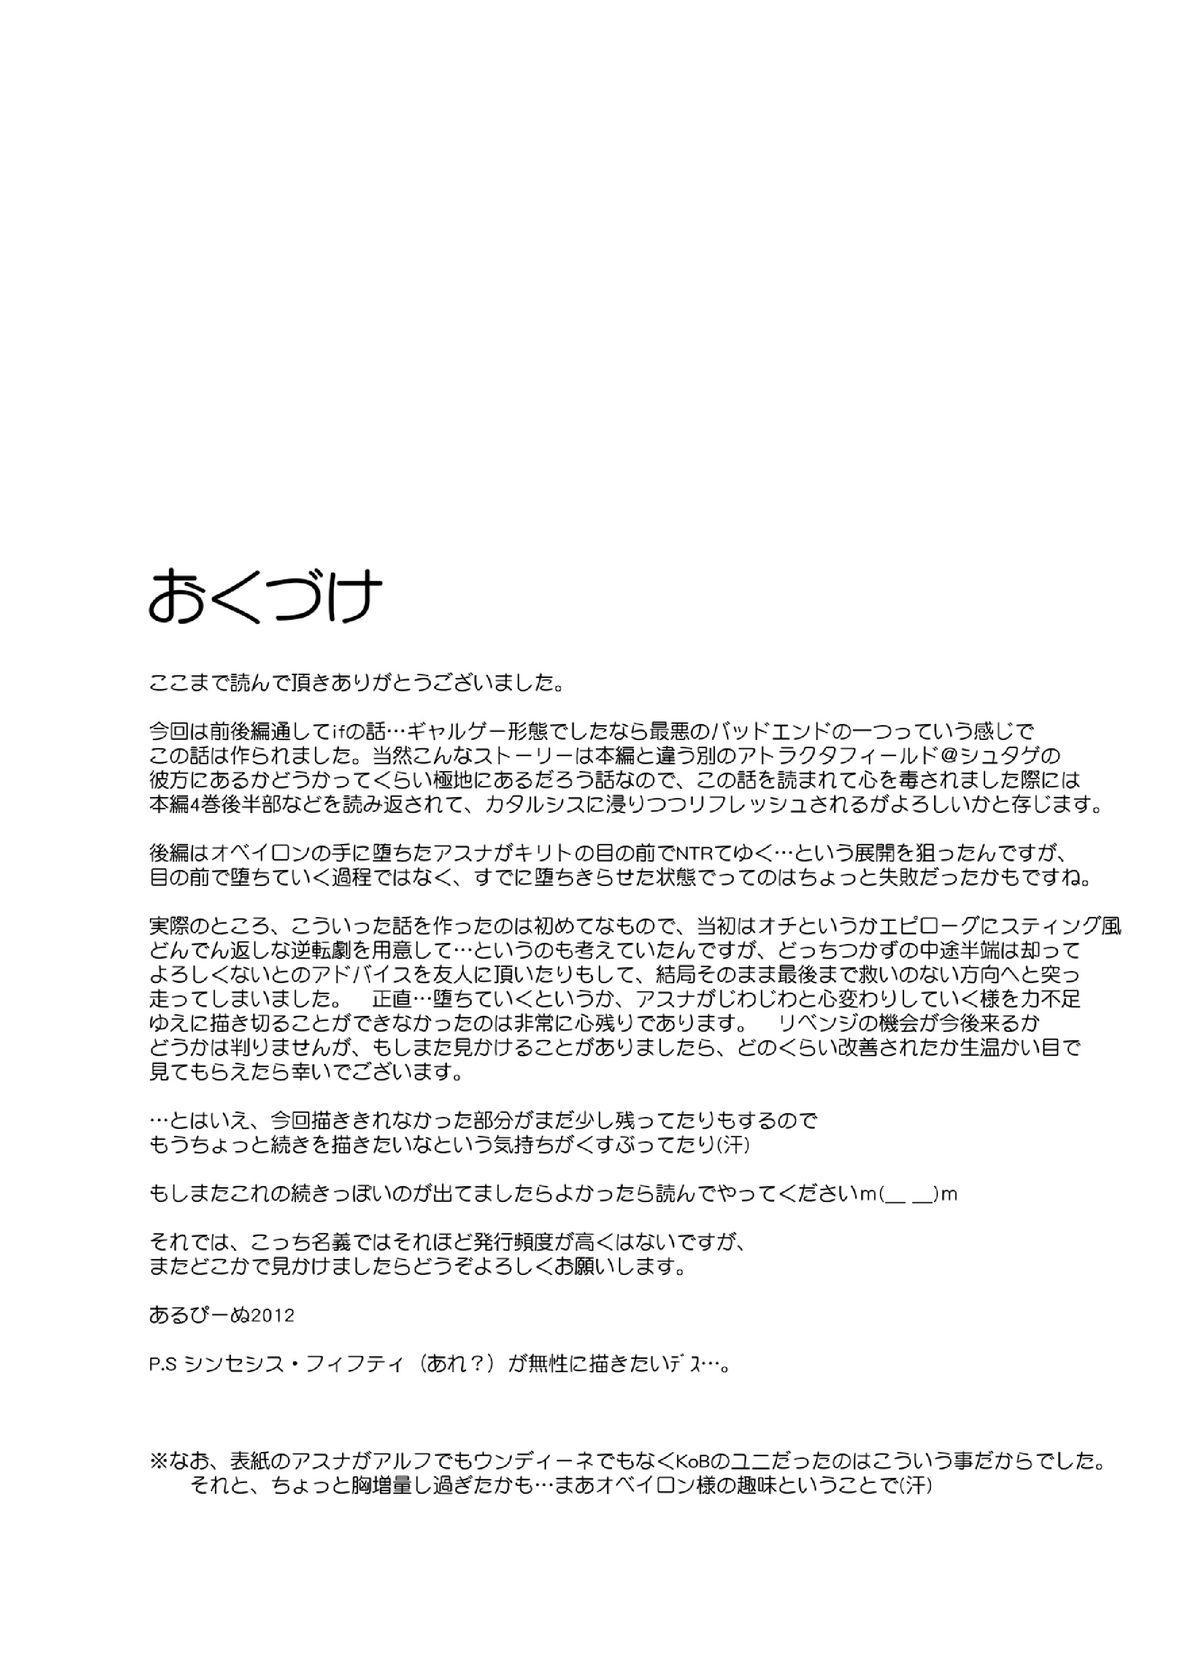 Slave Asuna On-Demand 2 39